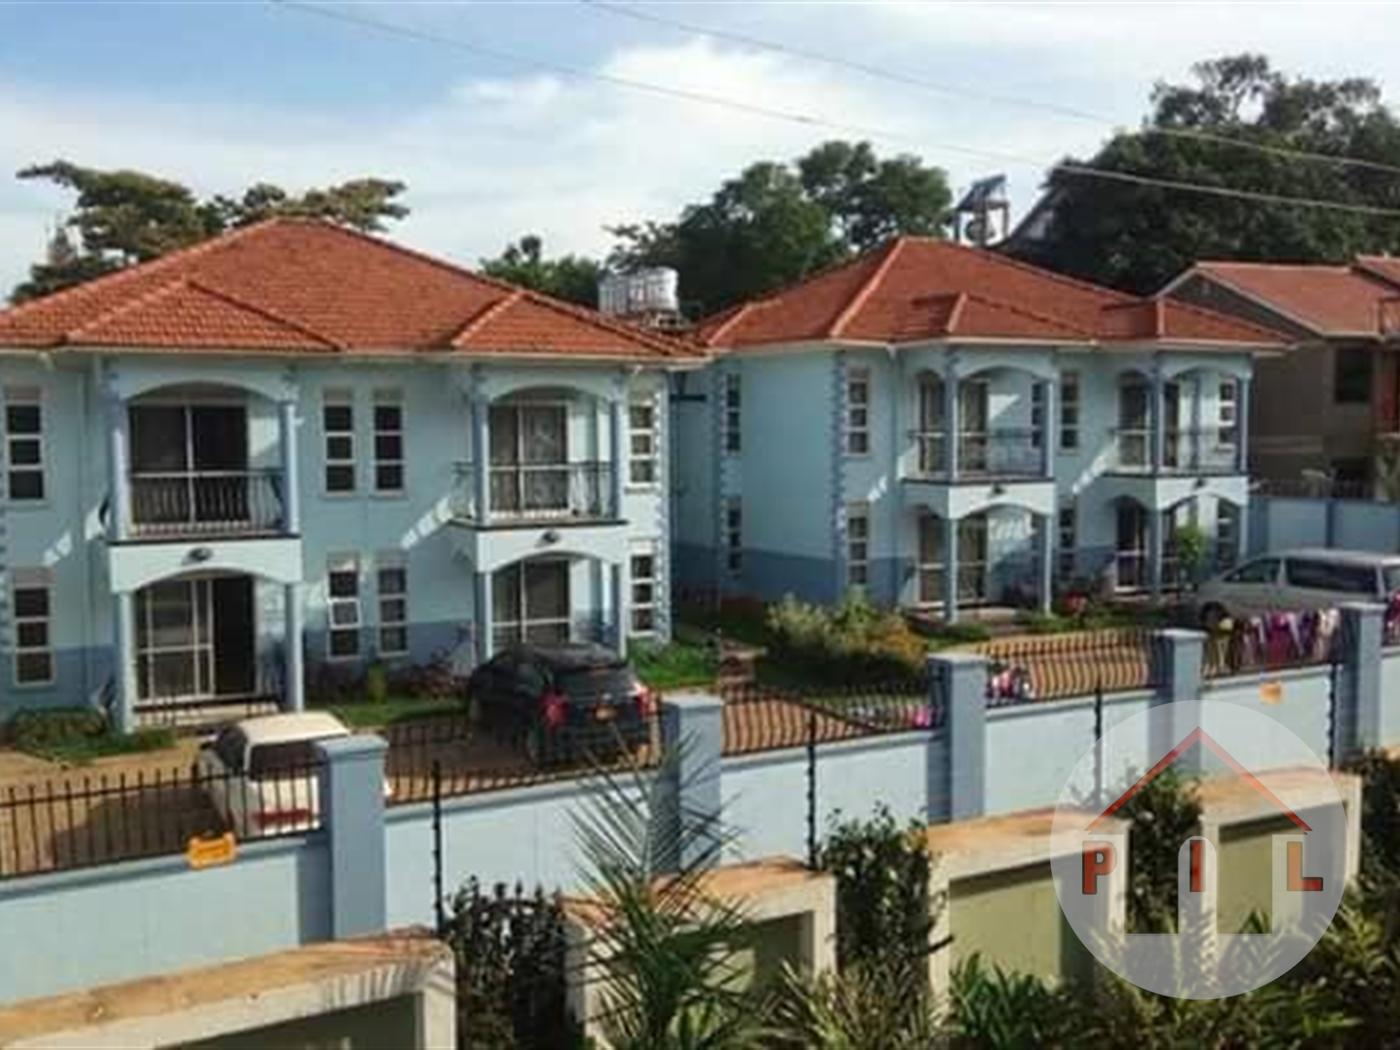 Apartment for sale in Munyonyo Kampala